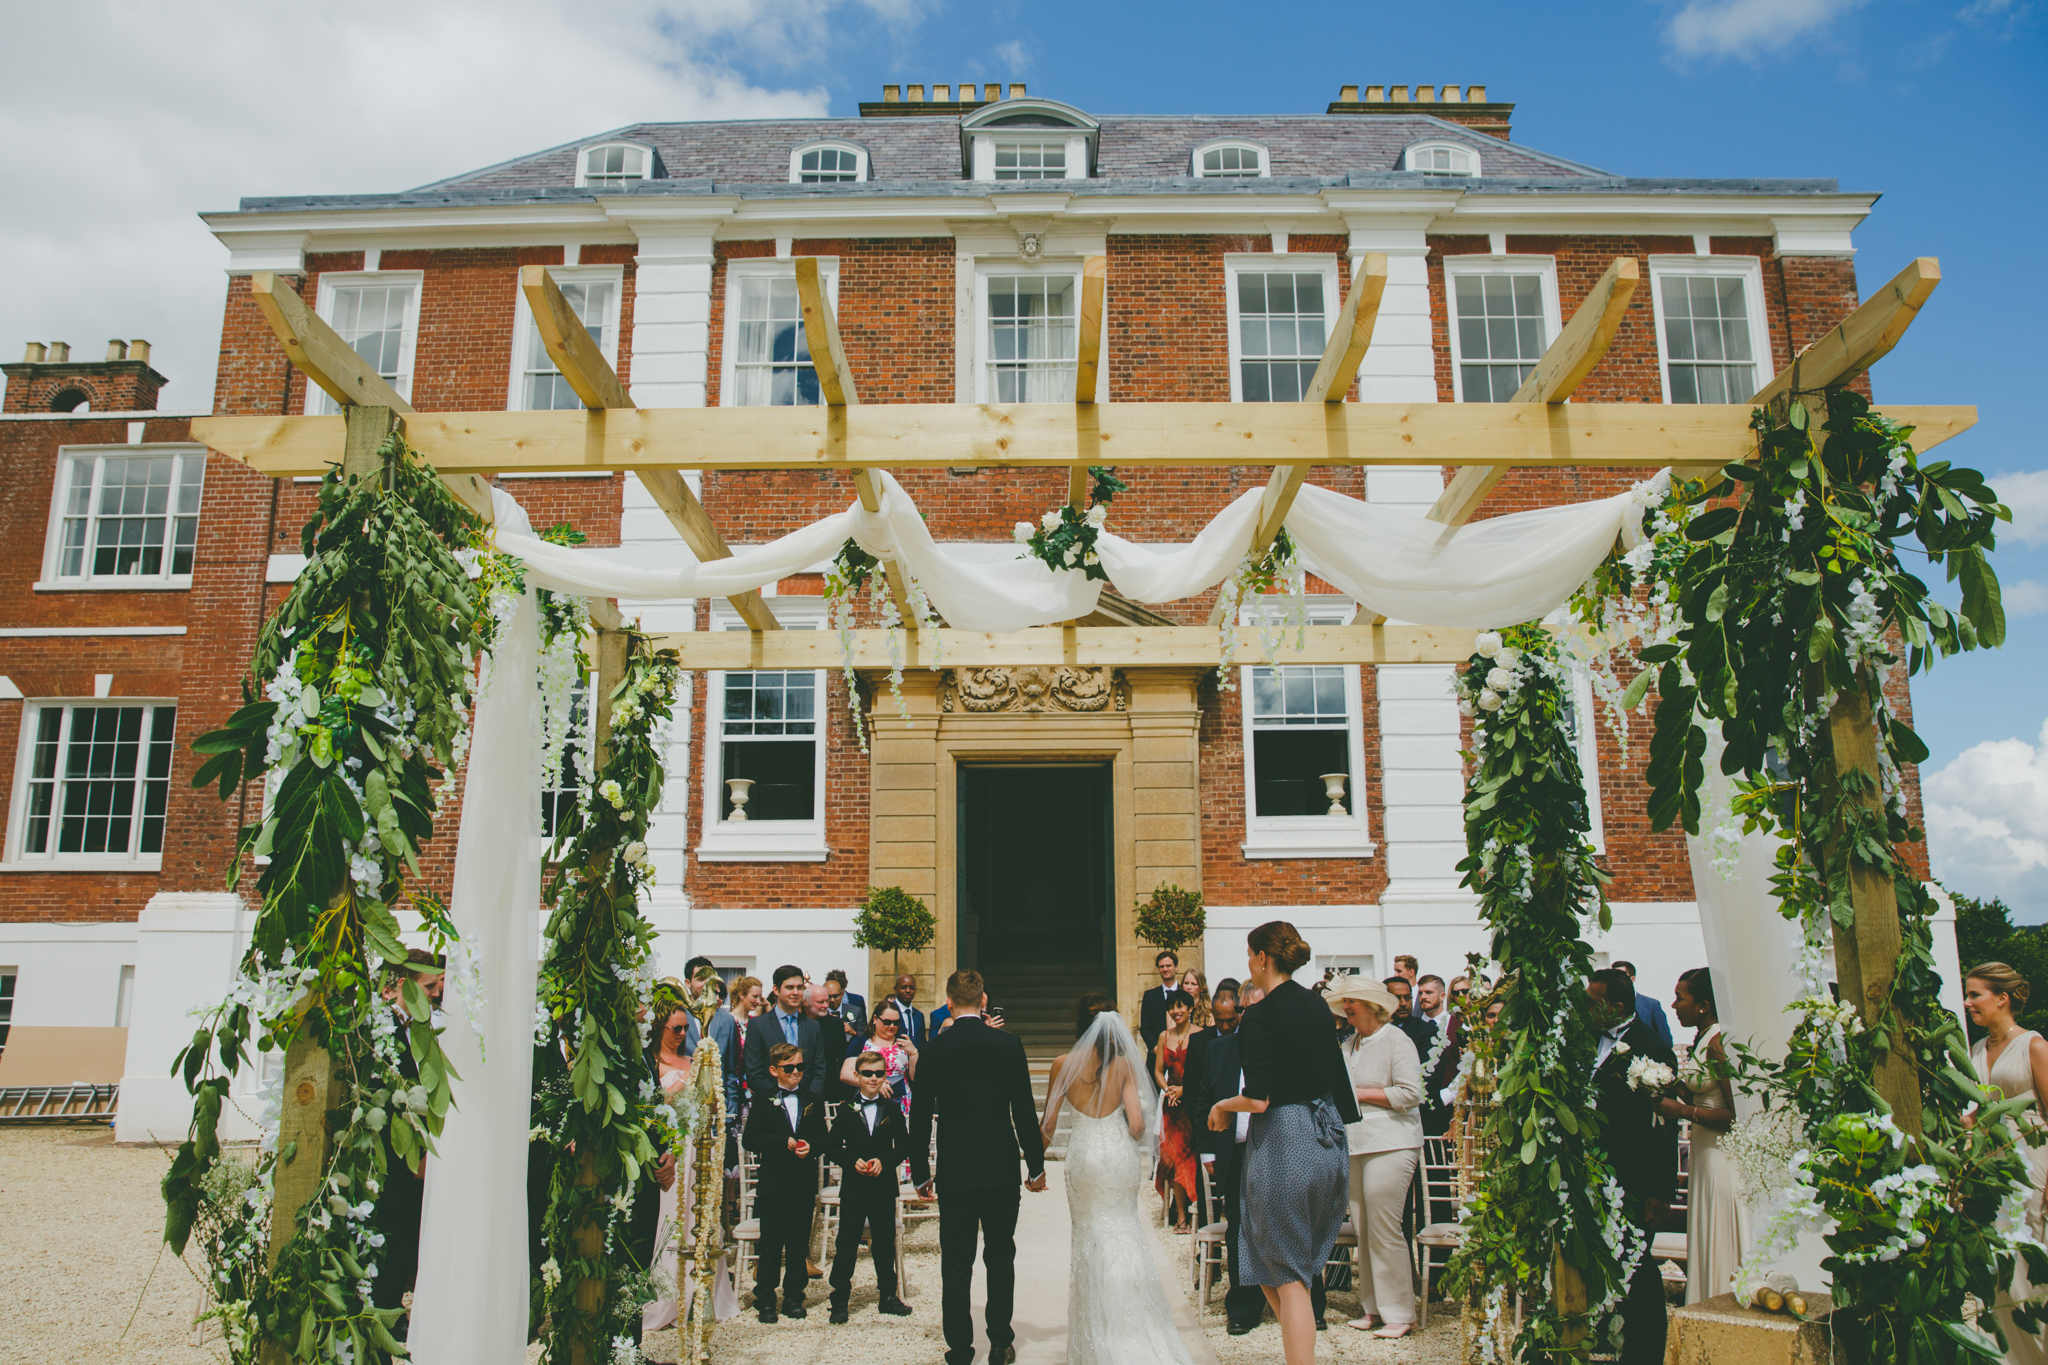 Amy Sampson   Devon Wedding Photographer   Ishani and Iain's Devon Wedding at Pyne's House, Exeter, Devon